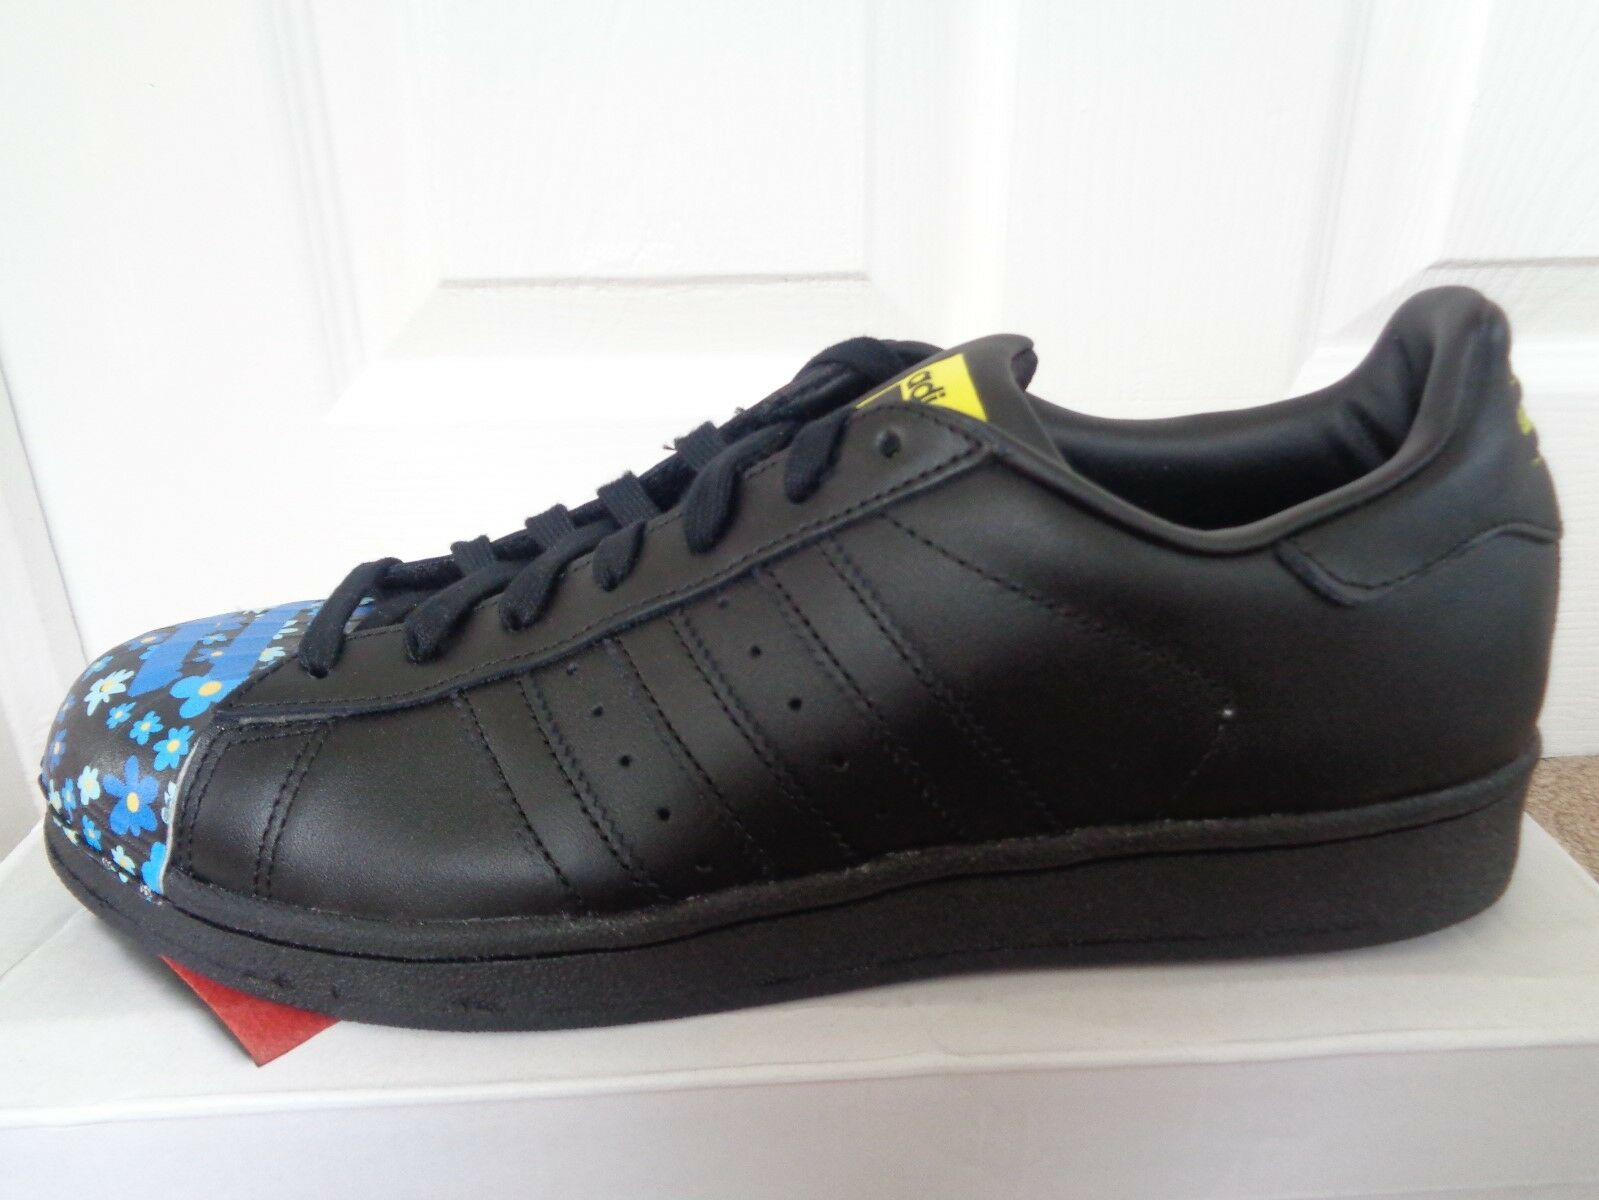 Adidas Superstar Pharrell Supersh trainers S83352 uk 7.5 eu 41 1 3 us 8 NEW+BOX